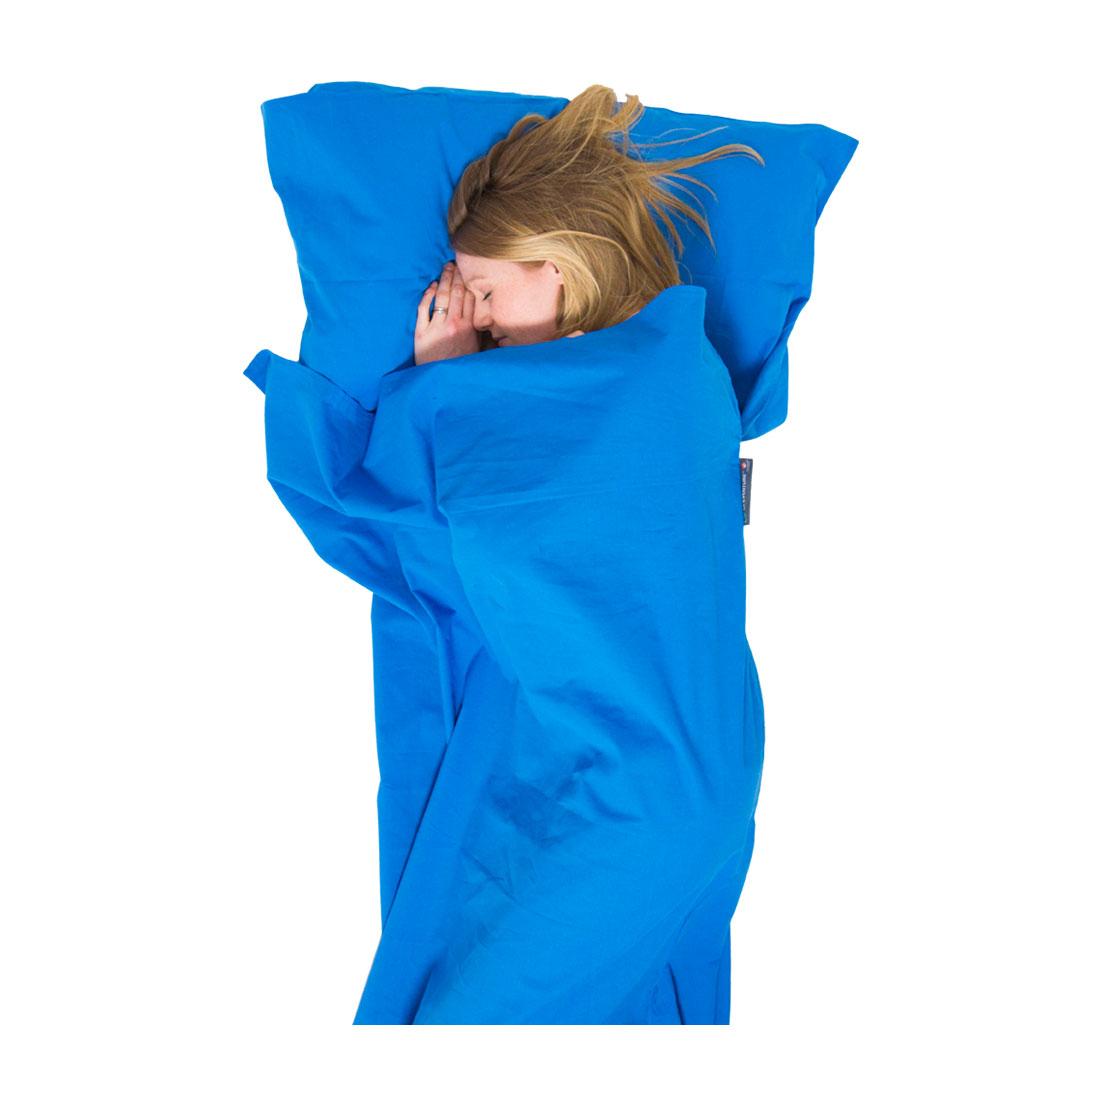 65530-65540_cotton-sleeping-bag-liner-rectangular-1